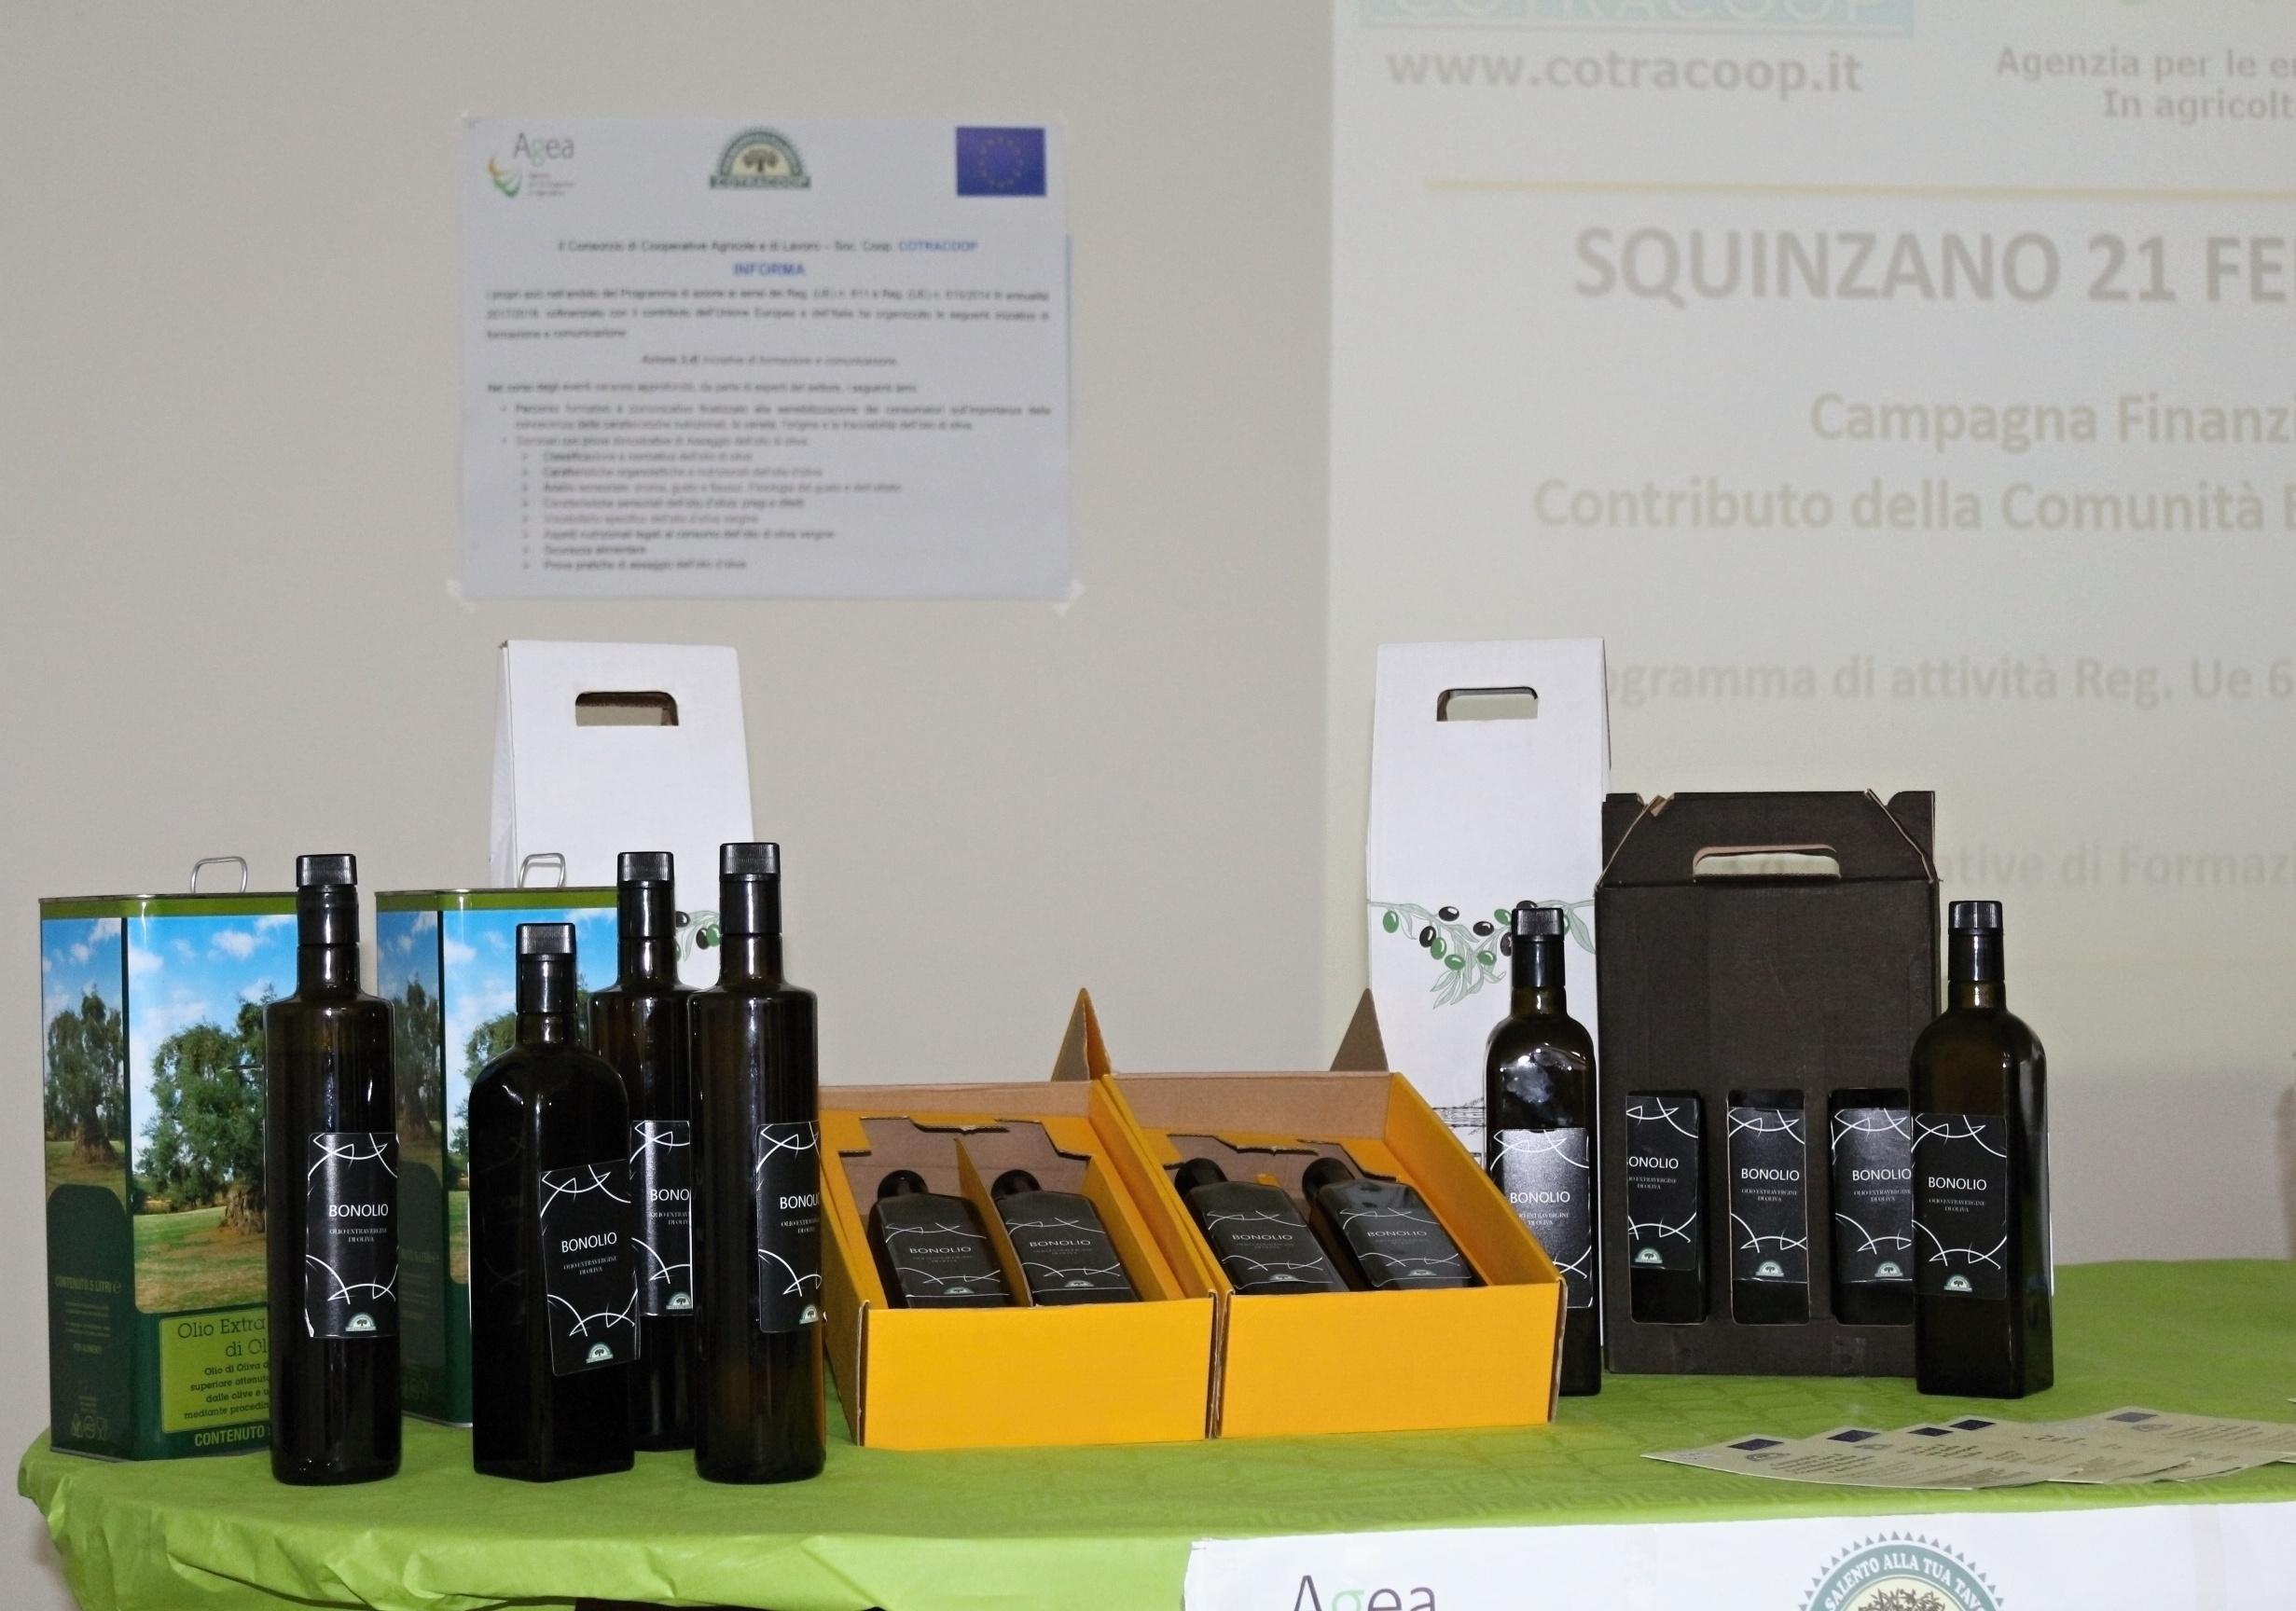 21/02/2018 Evento dimostrativo Soc. Coop. Agr. Squinzanese di Squinzano